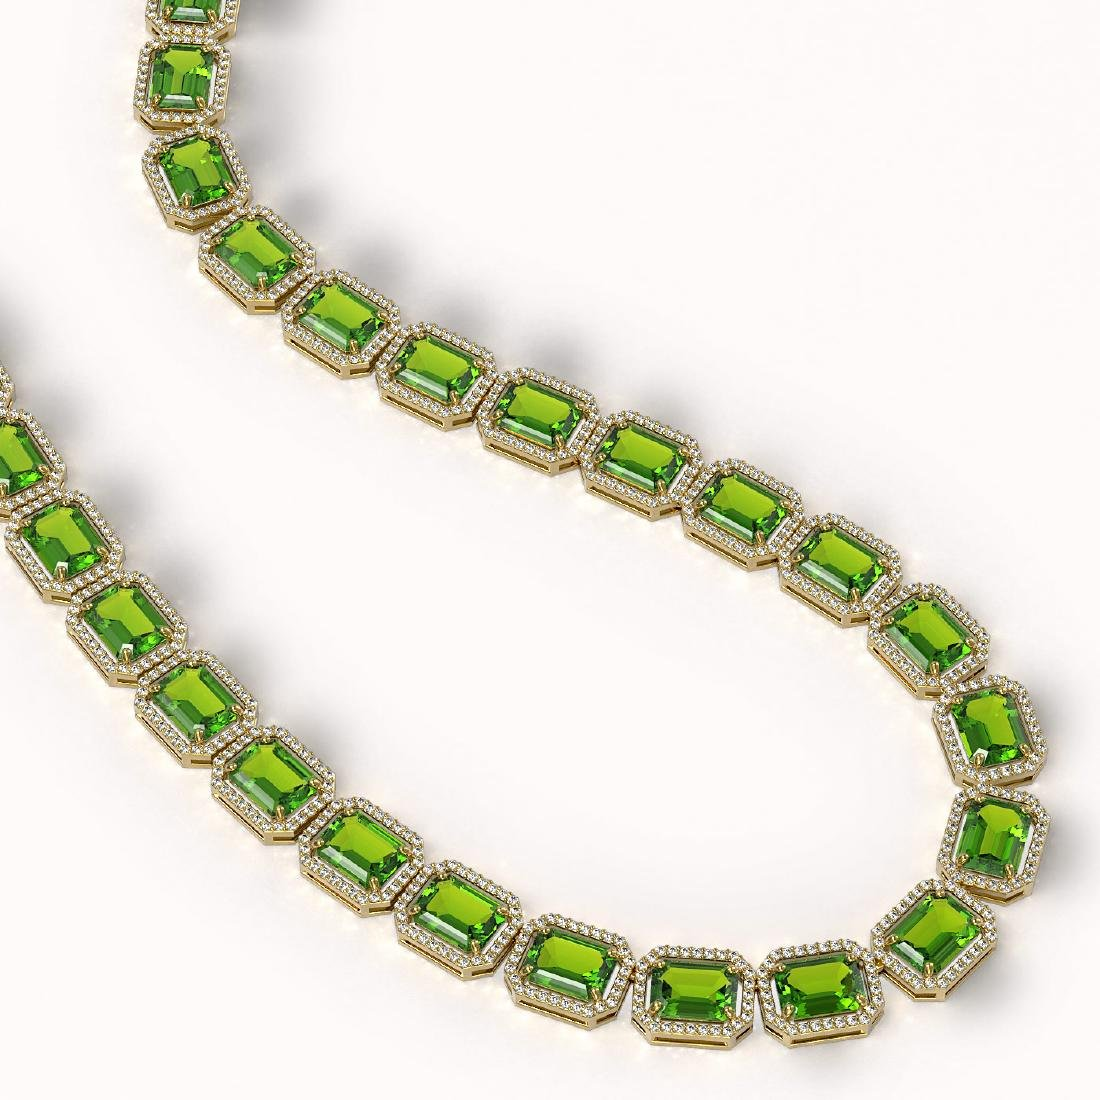 73.41 CTW Peridot & Diamond Halo Necklace 10K Yellow - 2